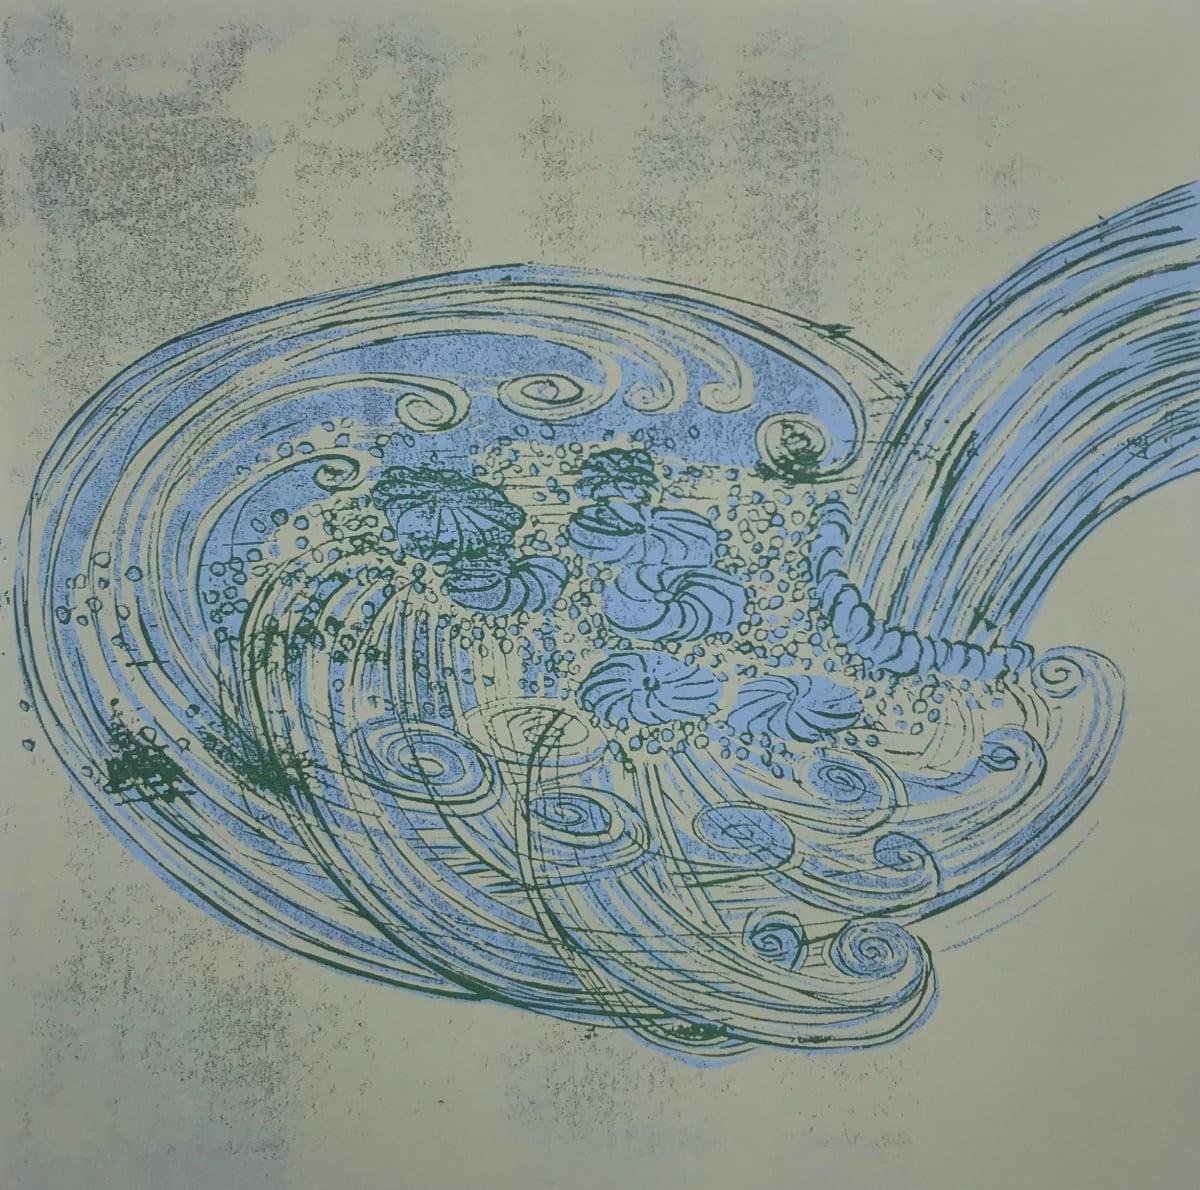 Yoko Omomi Whirlpool (after da Vinci), 2019 Linocut 40 x 40 cm